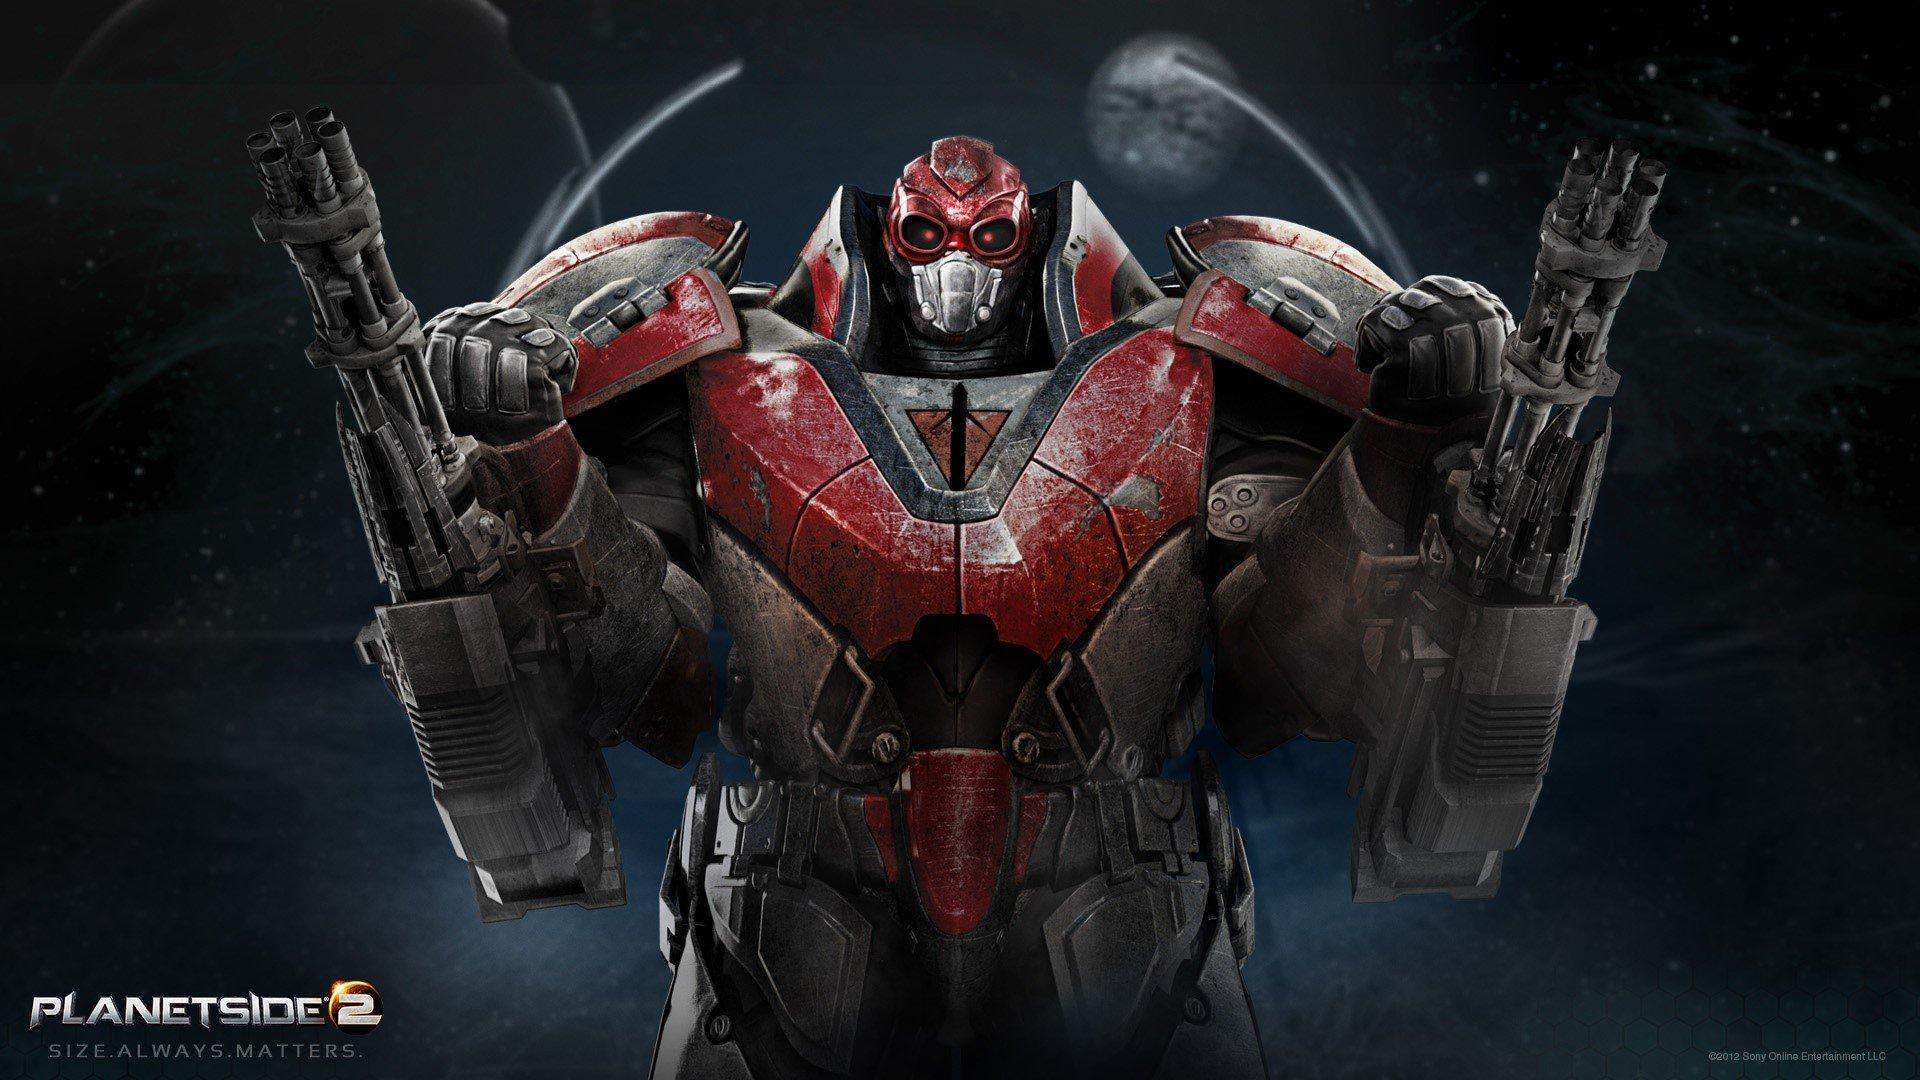 Fondos de pantalla Planetside 2 Max Suit